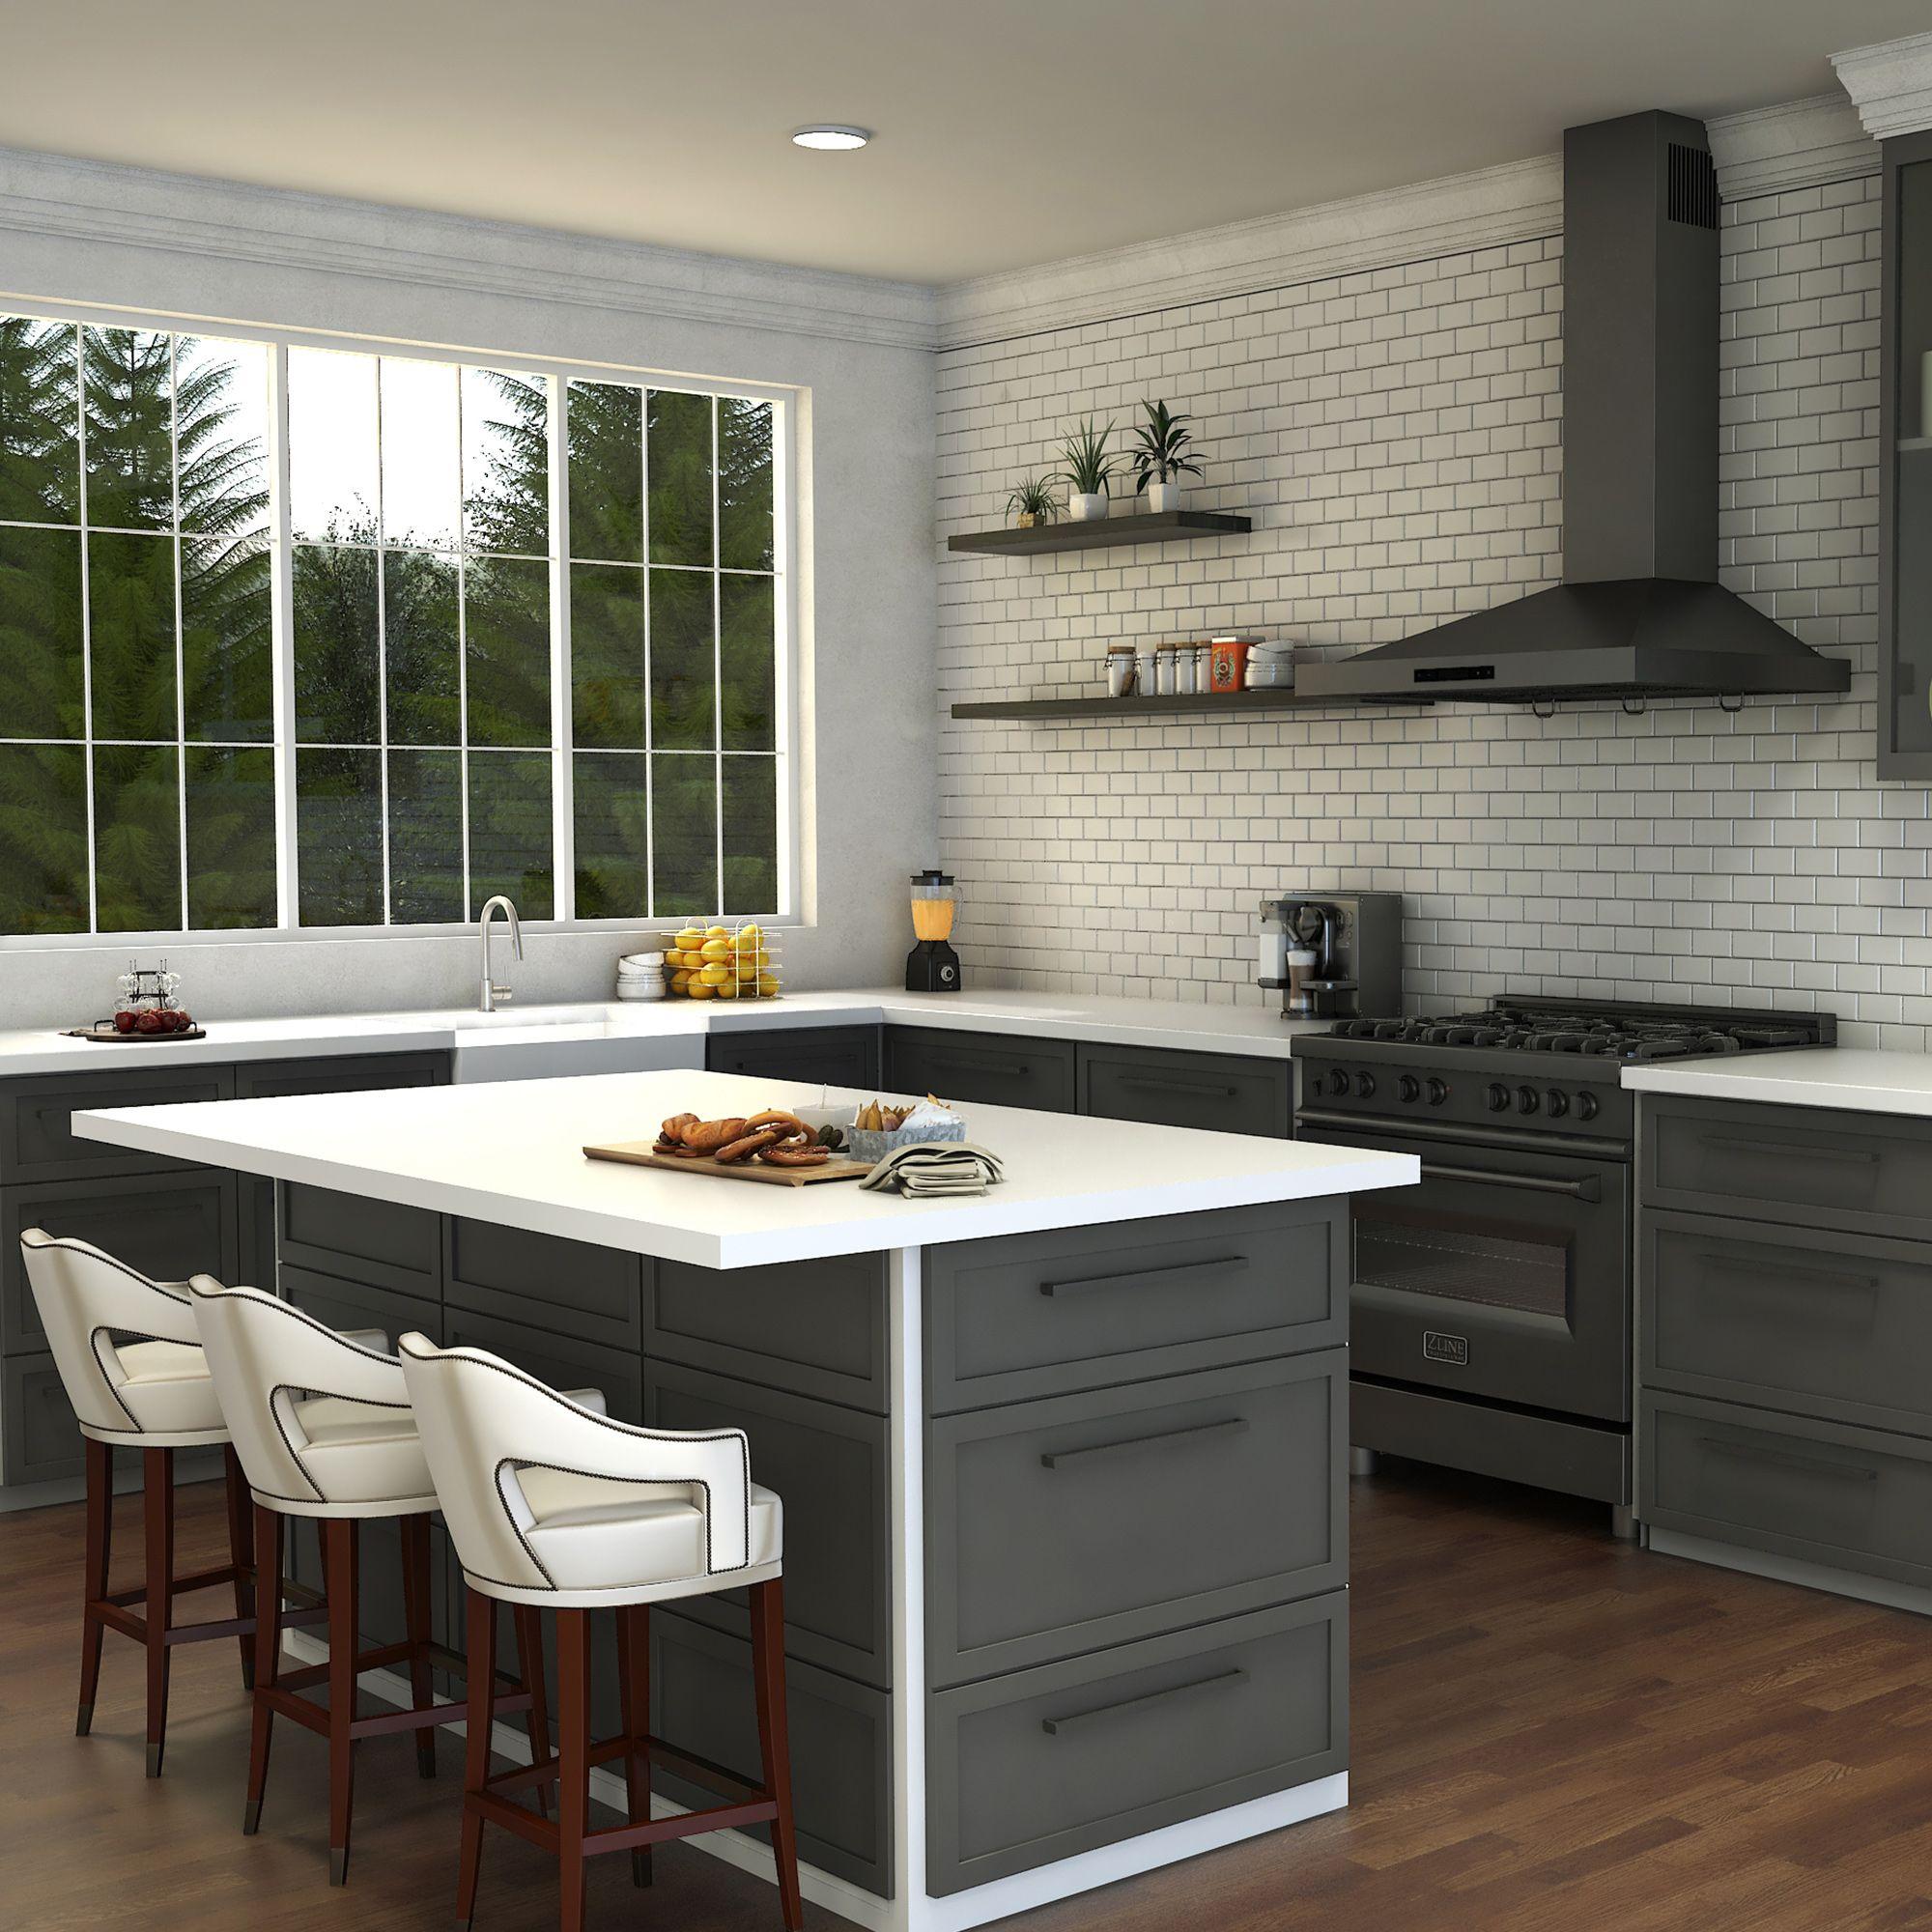 Zline Gemini Kitchen Faucet In Brushed Nickel Gem Kf Bn Kitchen Remodel Kitchen Design Kitchen Faucet Design